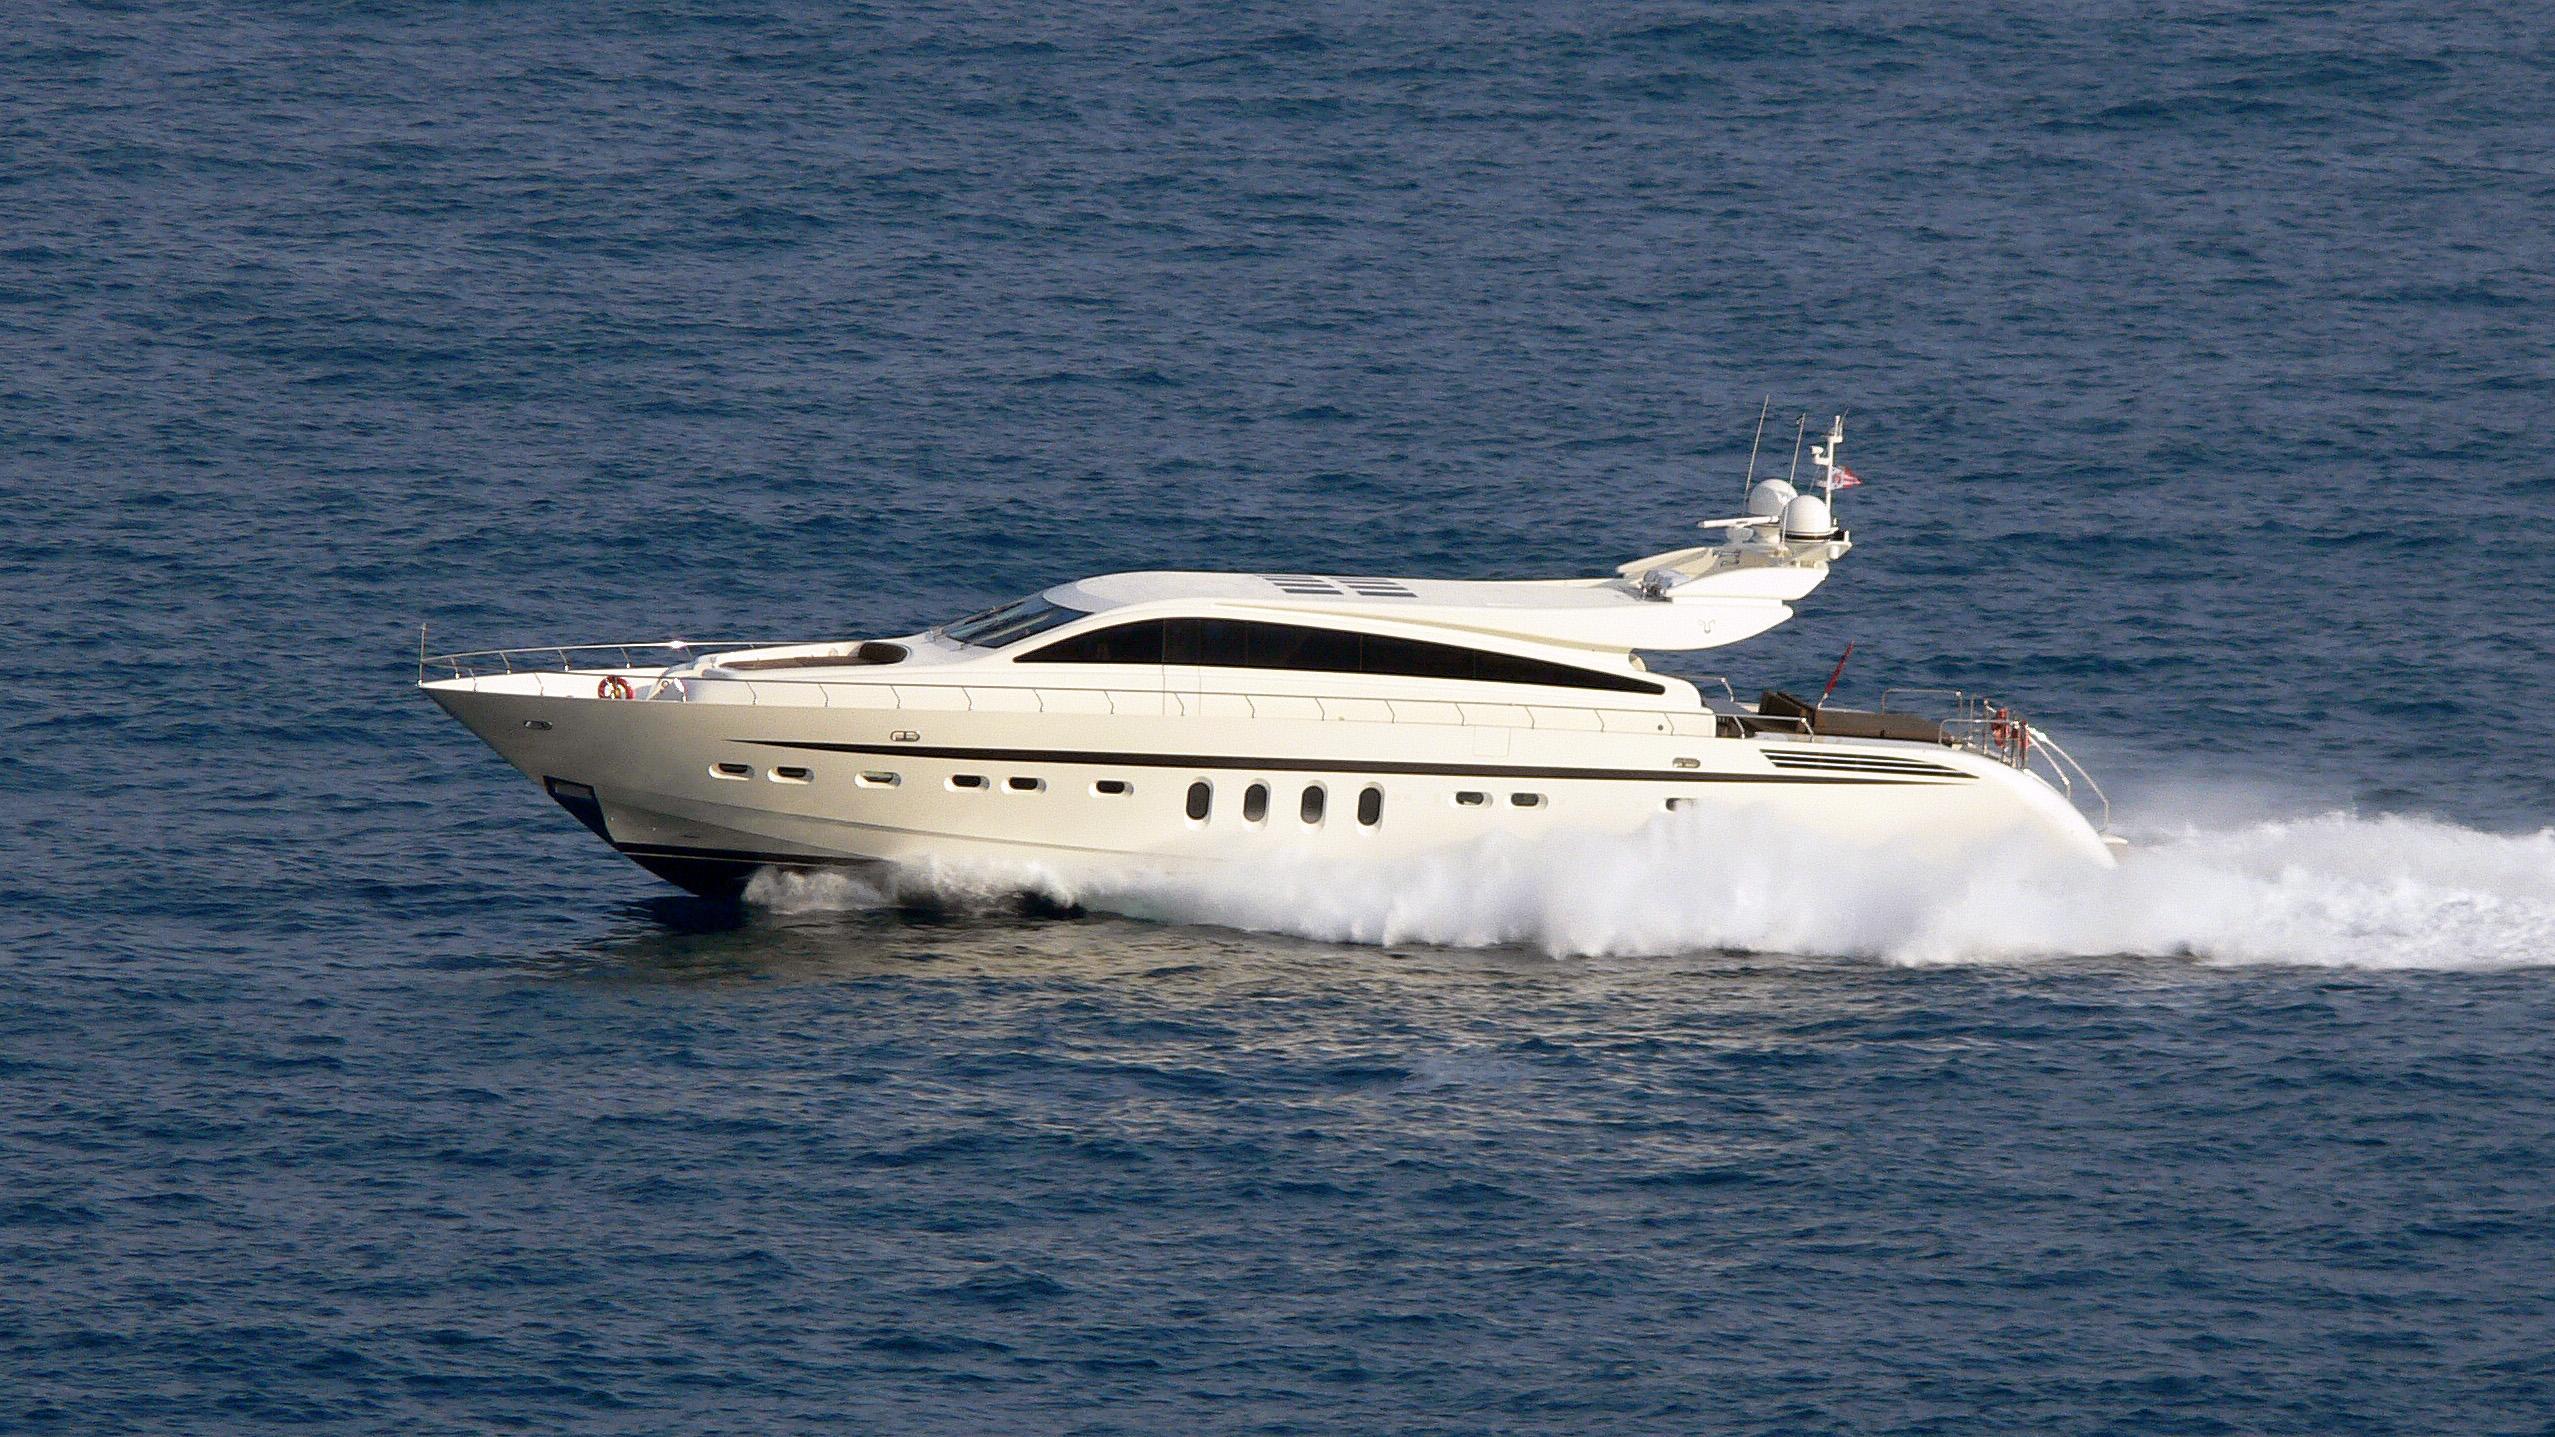 aleon-motor-yacht-arno-leopard-31-sport-2006-31m-profile-cruising